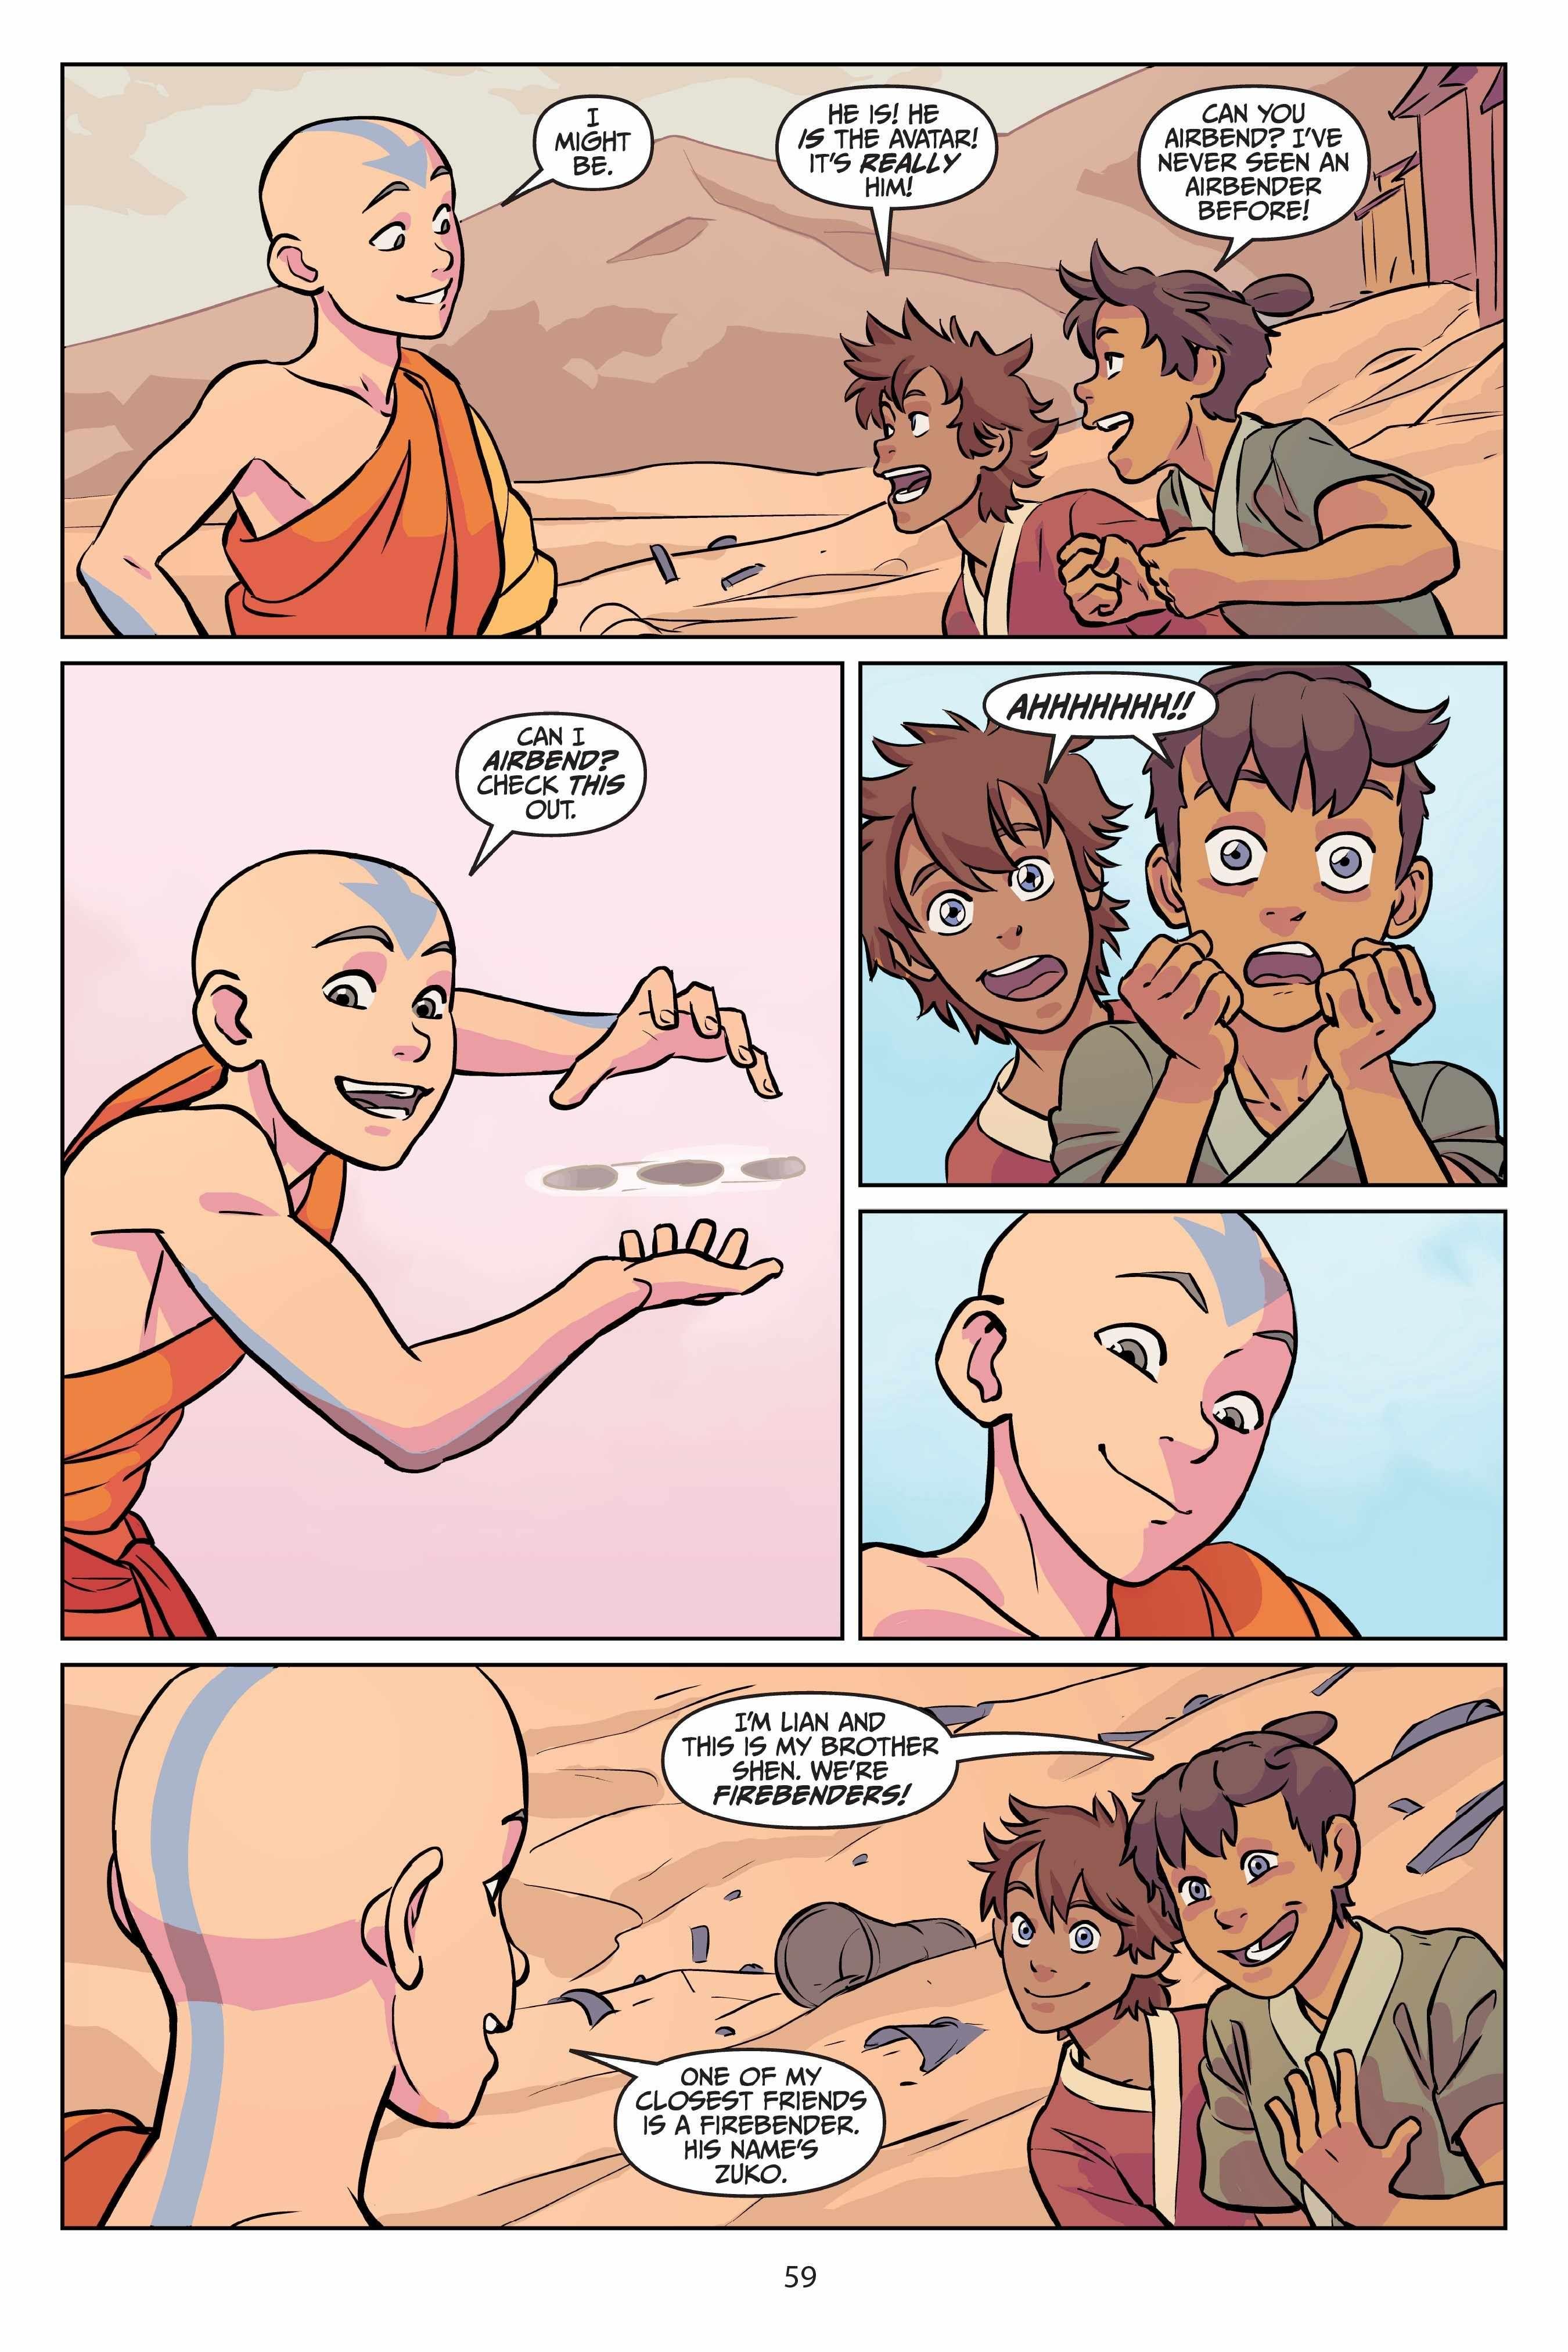 Shen Avatar Halloween 2020 Read Comics Online Free   Avatar The Last Airbender Comic Book